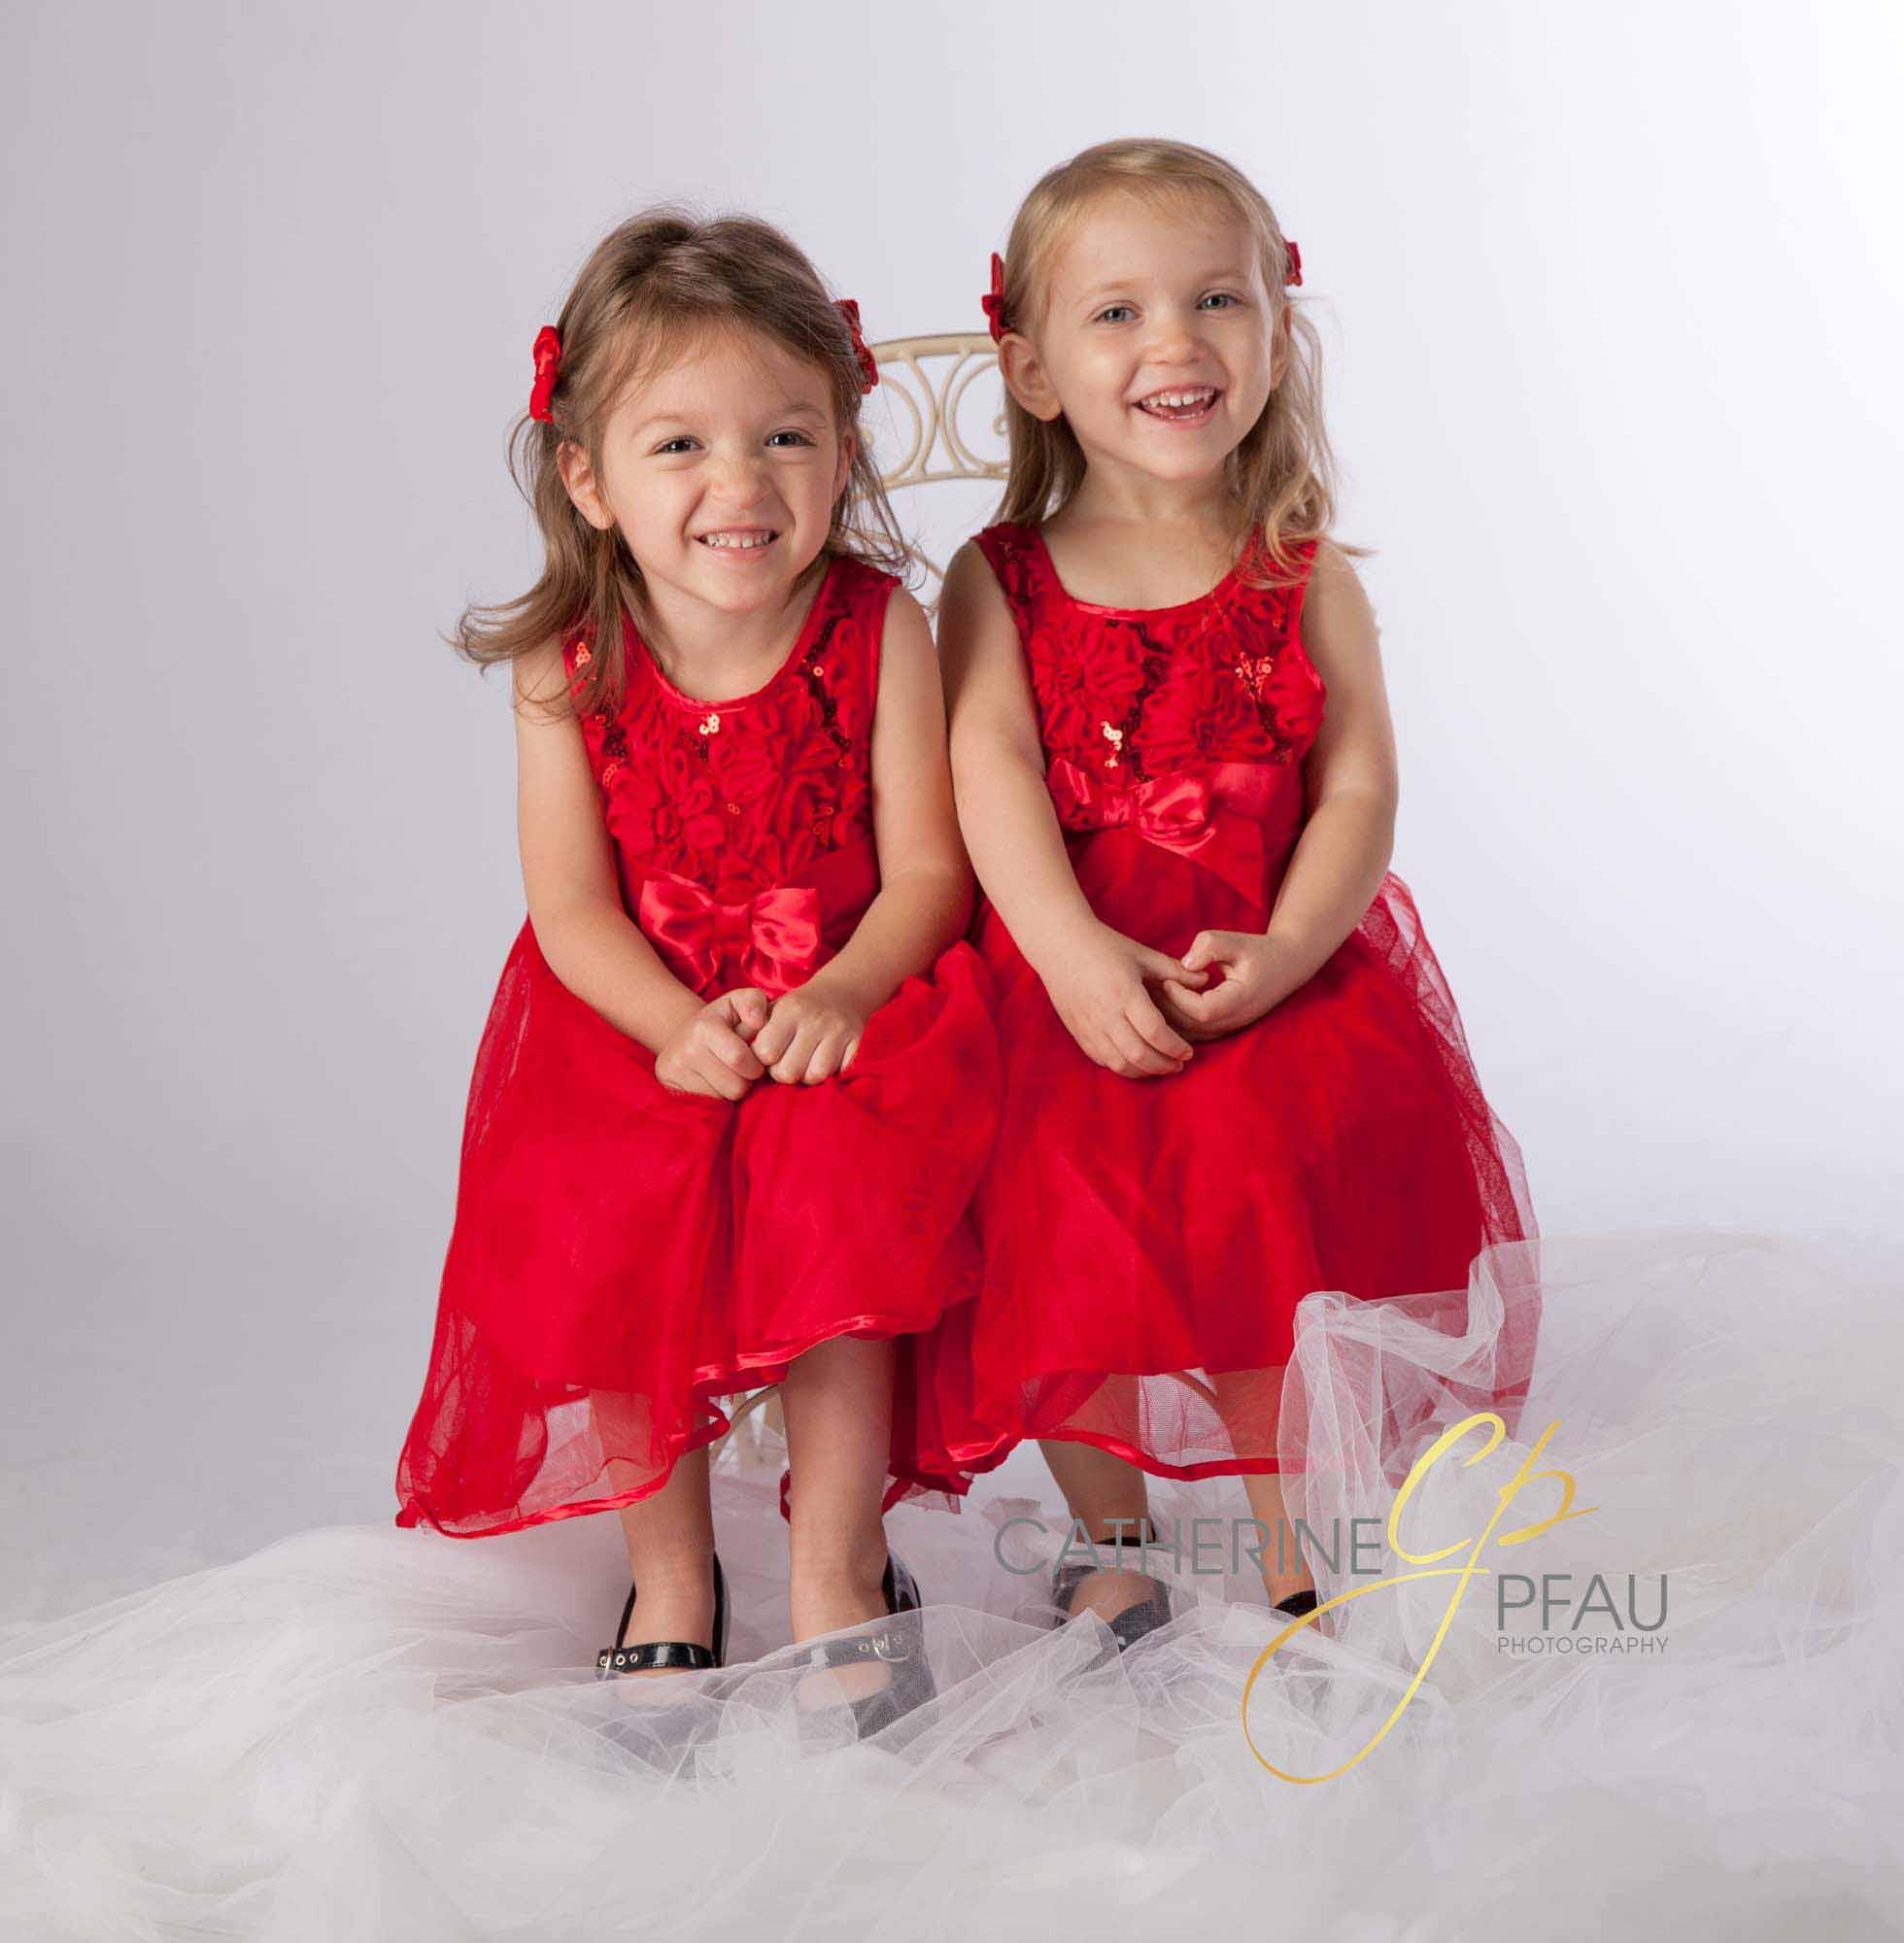 catherinepfauphotography_familyportrait_children_photography-4.jpg